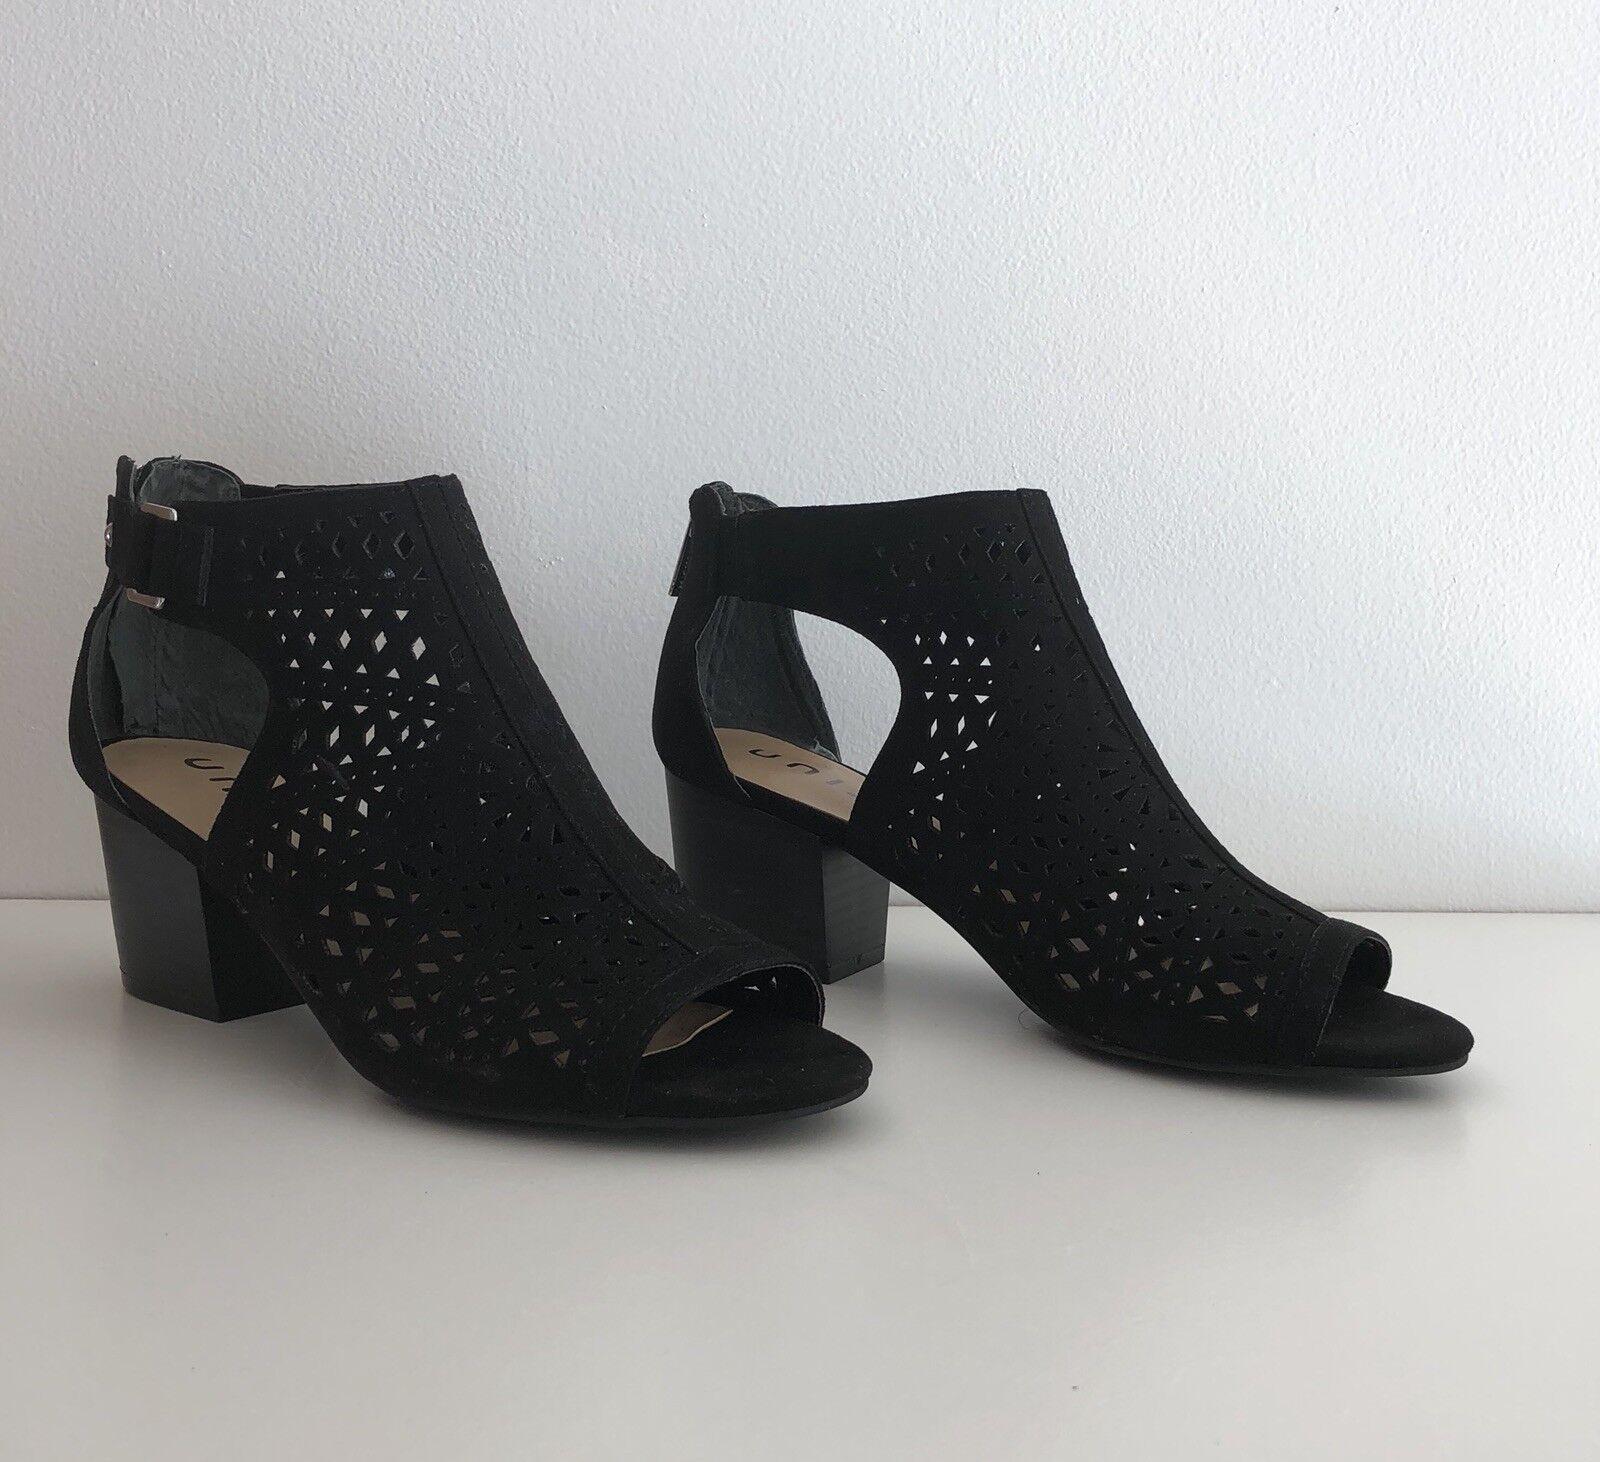 UNISA Women's shoes 8.5 Black Fabric NEW